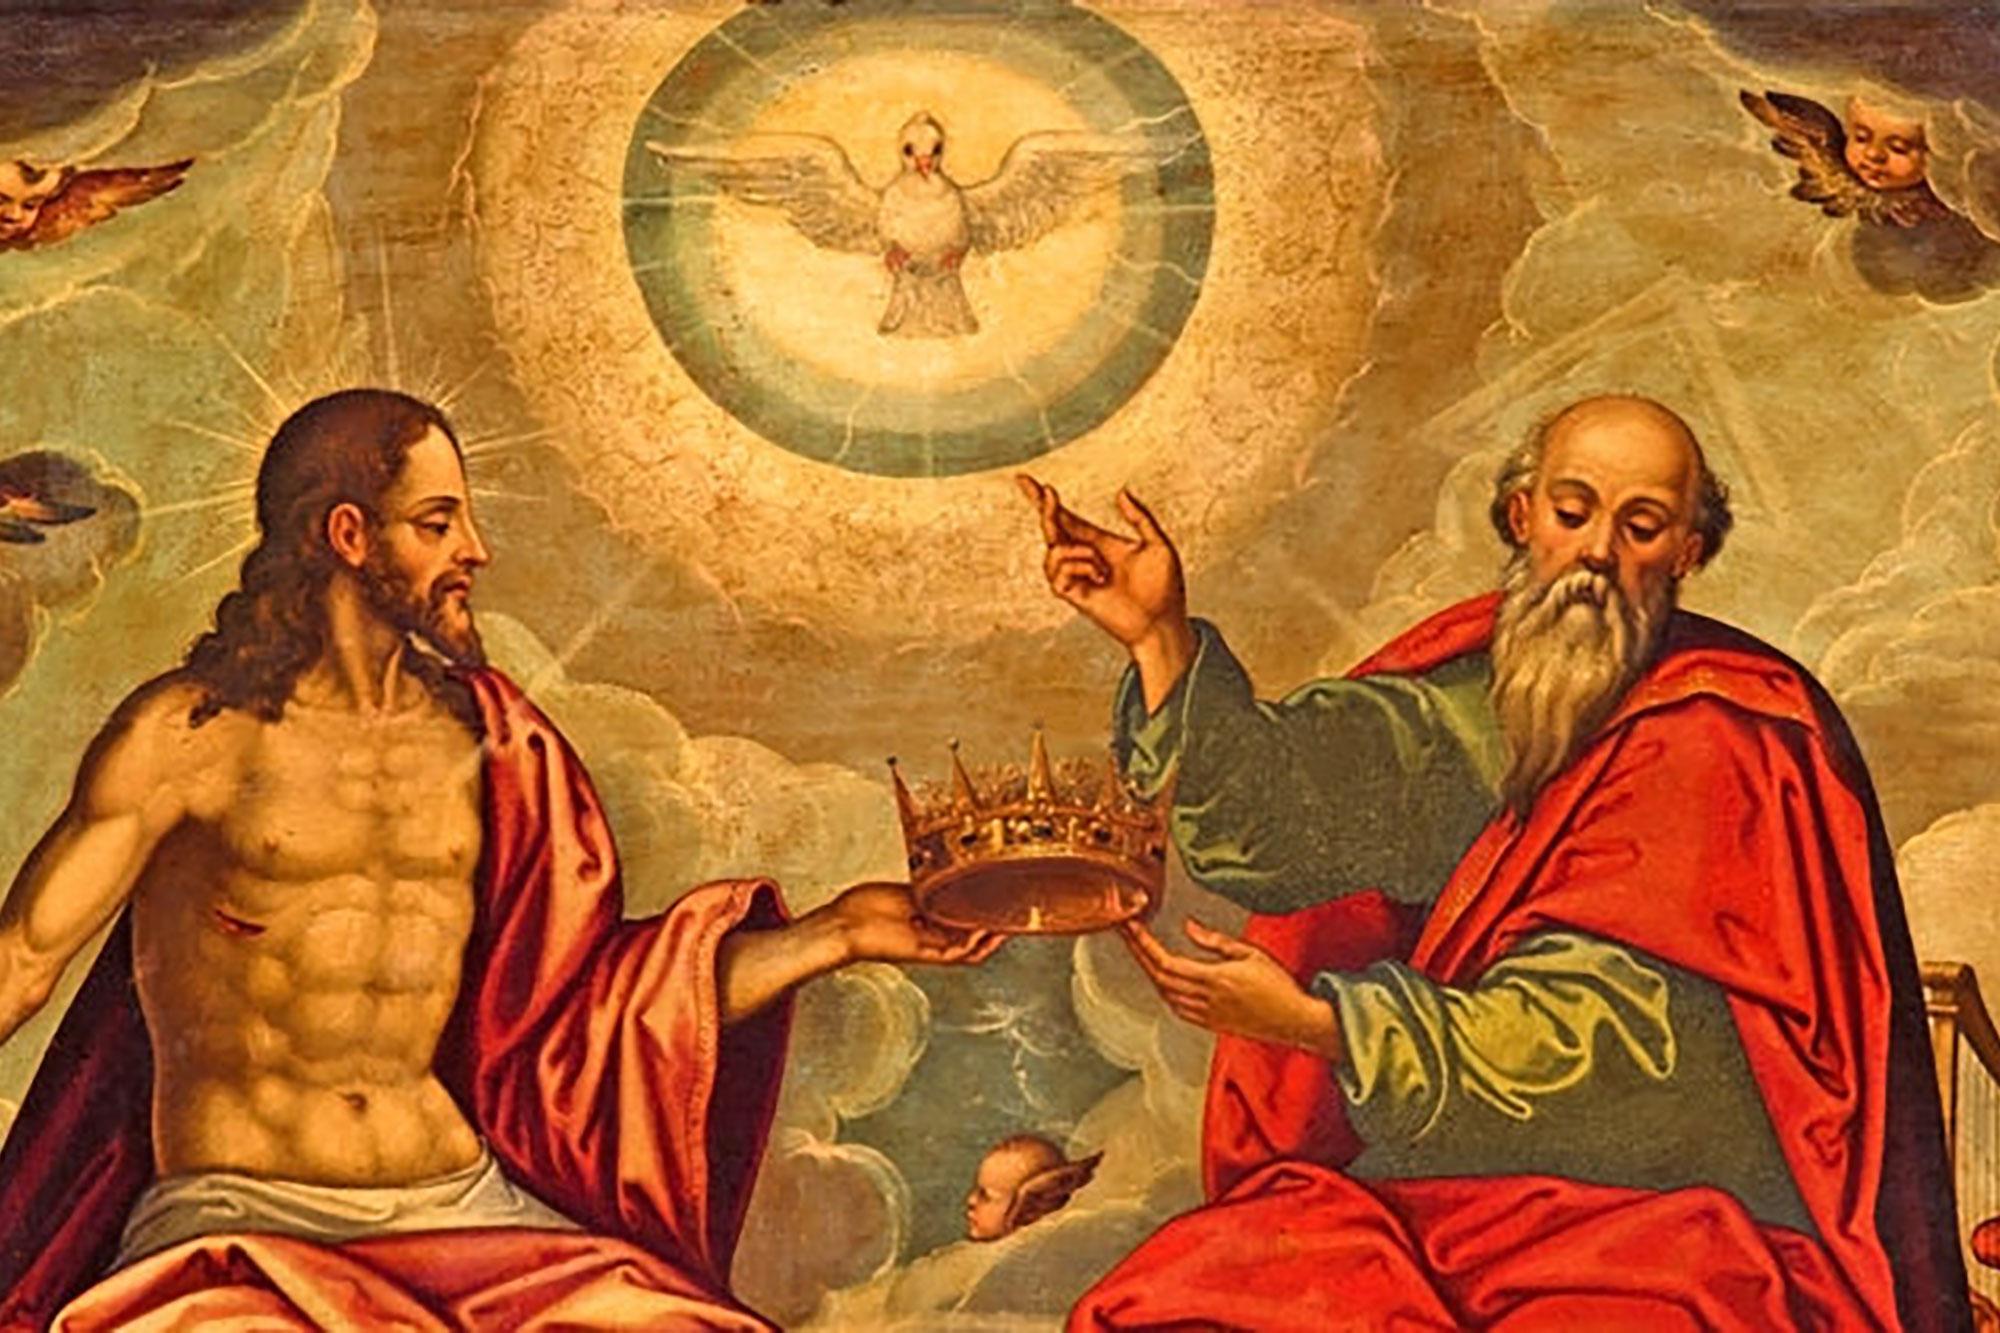 holy-trinity-painting-art-religious-father-son-holy-spirit-shutterstock_236732077-renata-sedmakova-shutterstock-846x423